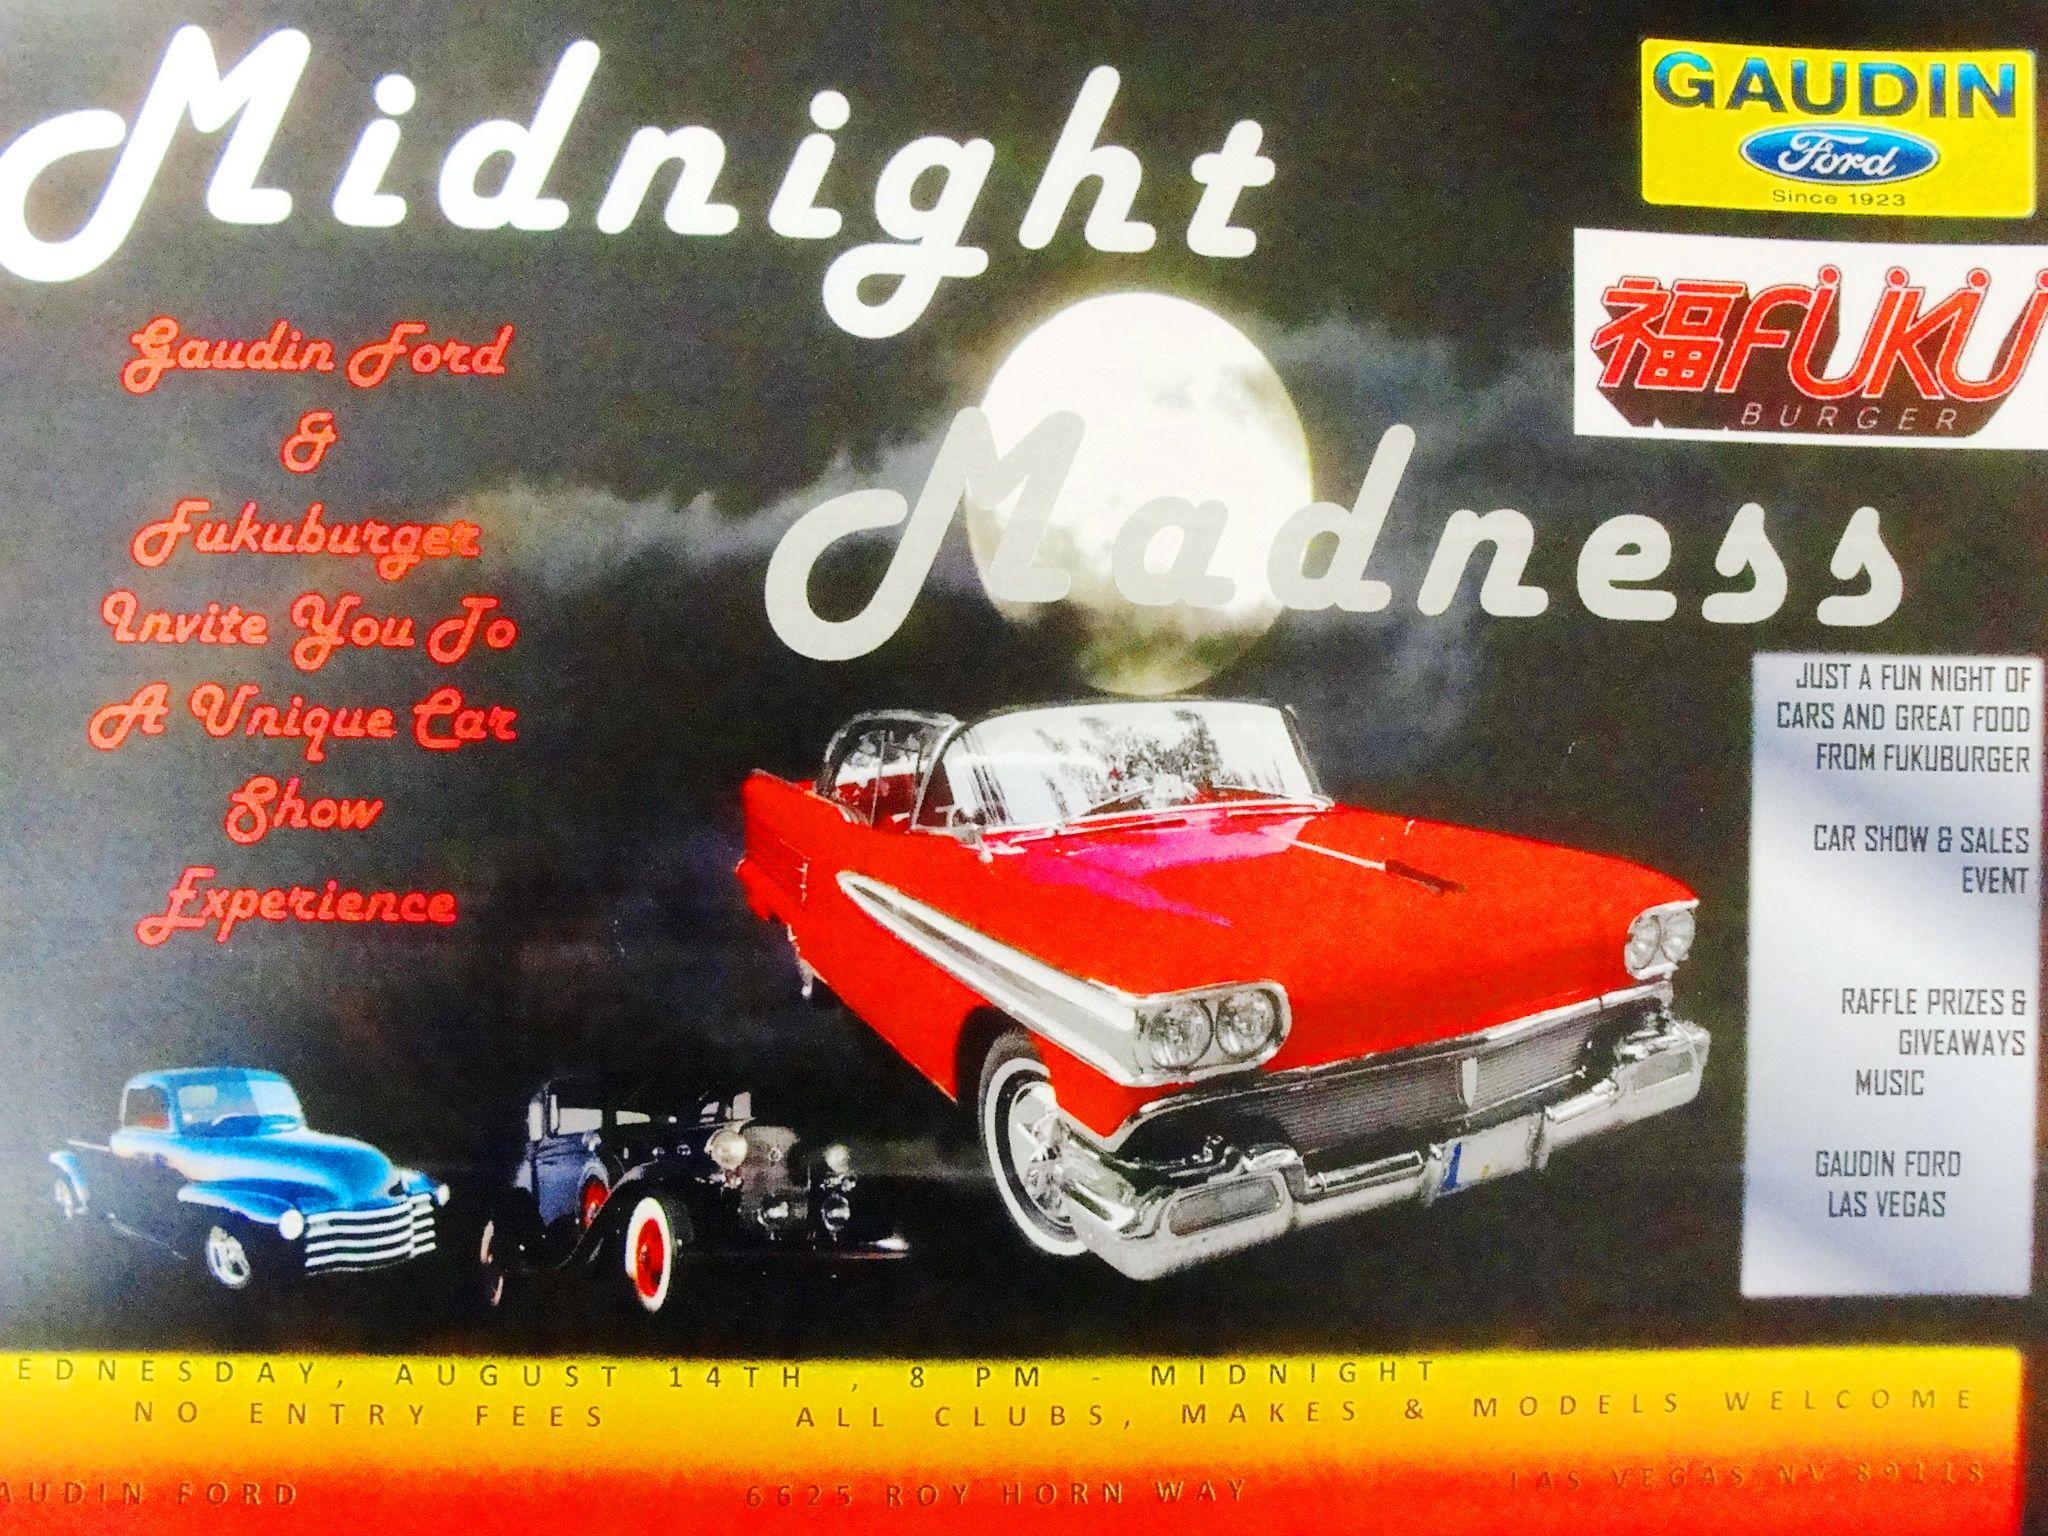 Midnight Madness Car Show & Sales Event